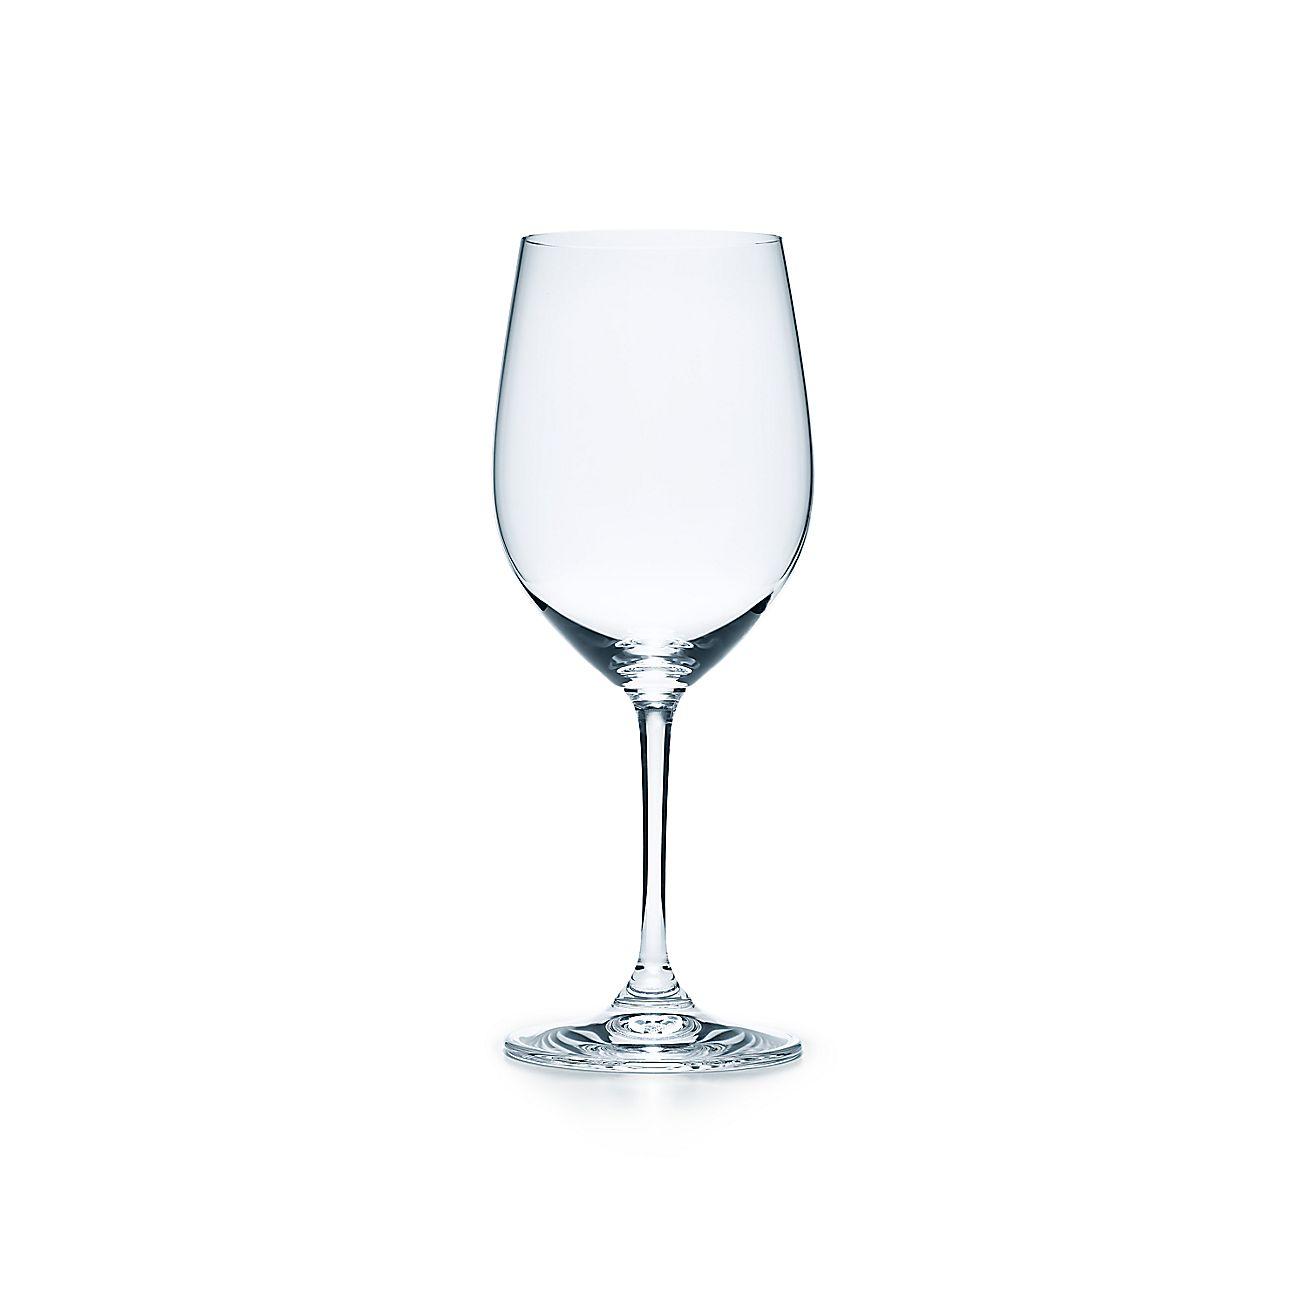 Riedel:Vinum Chardonnay<br>Wine Glass